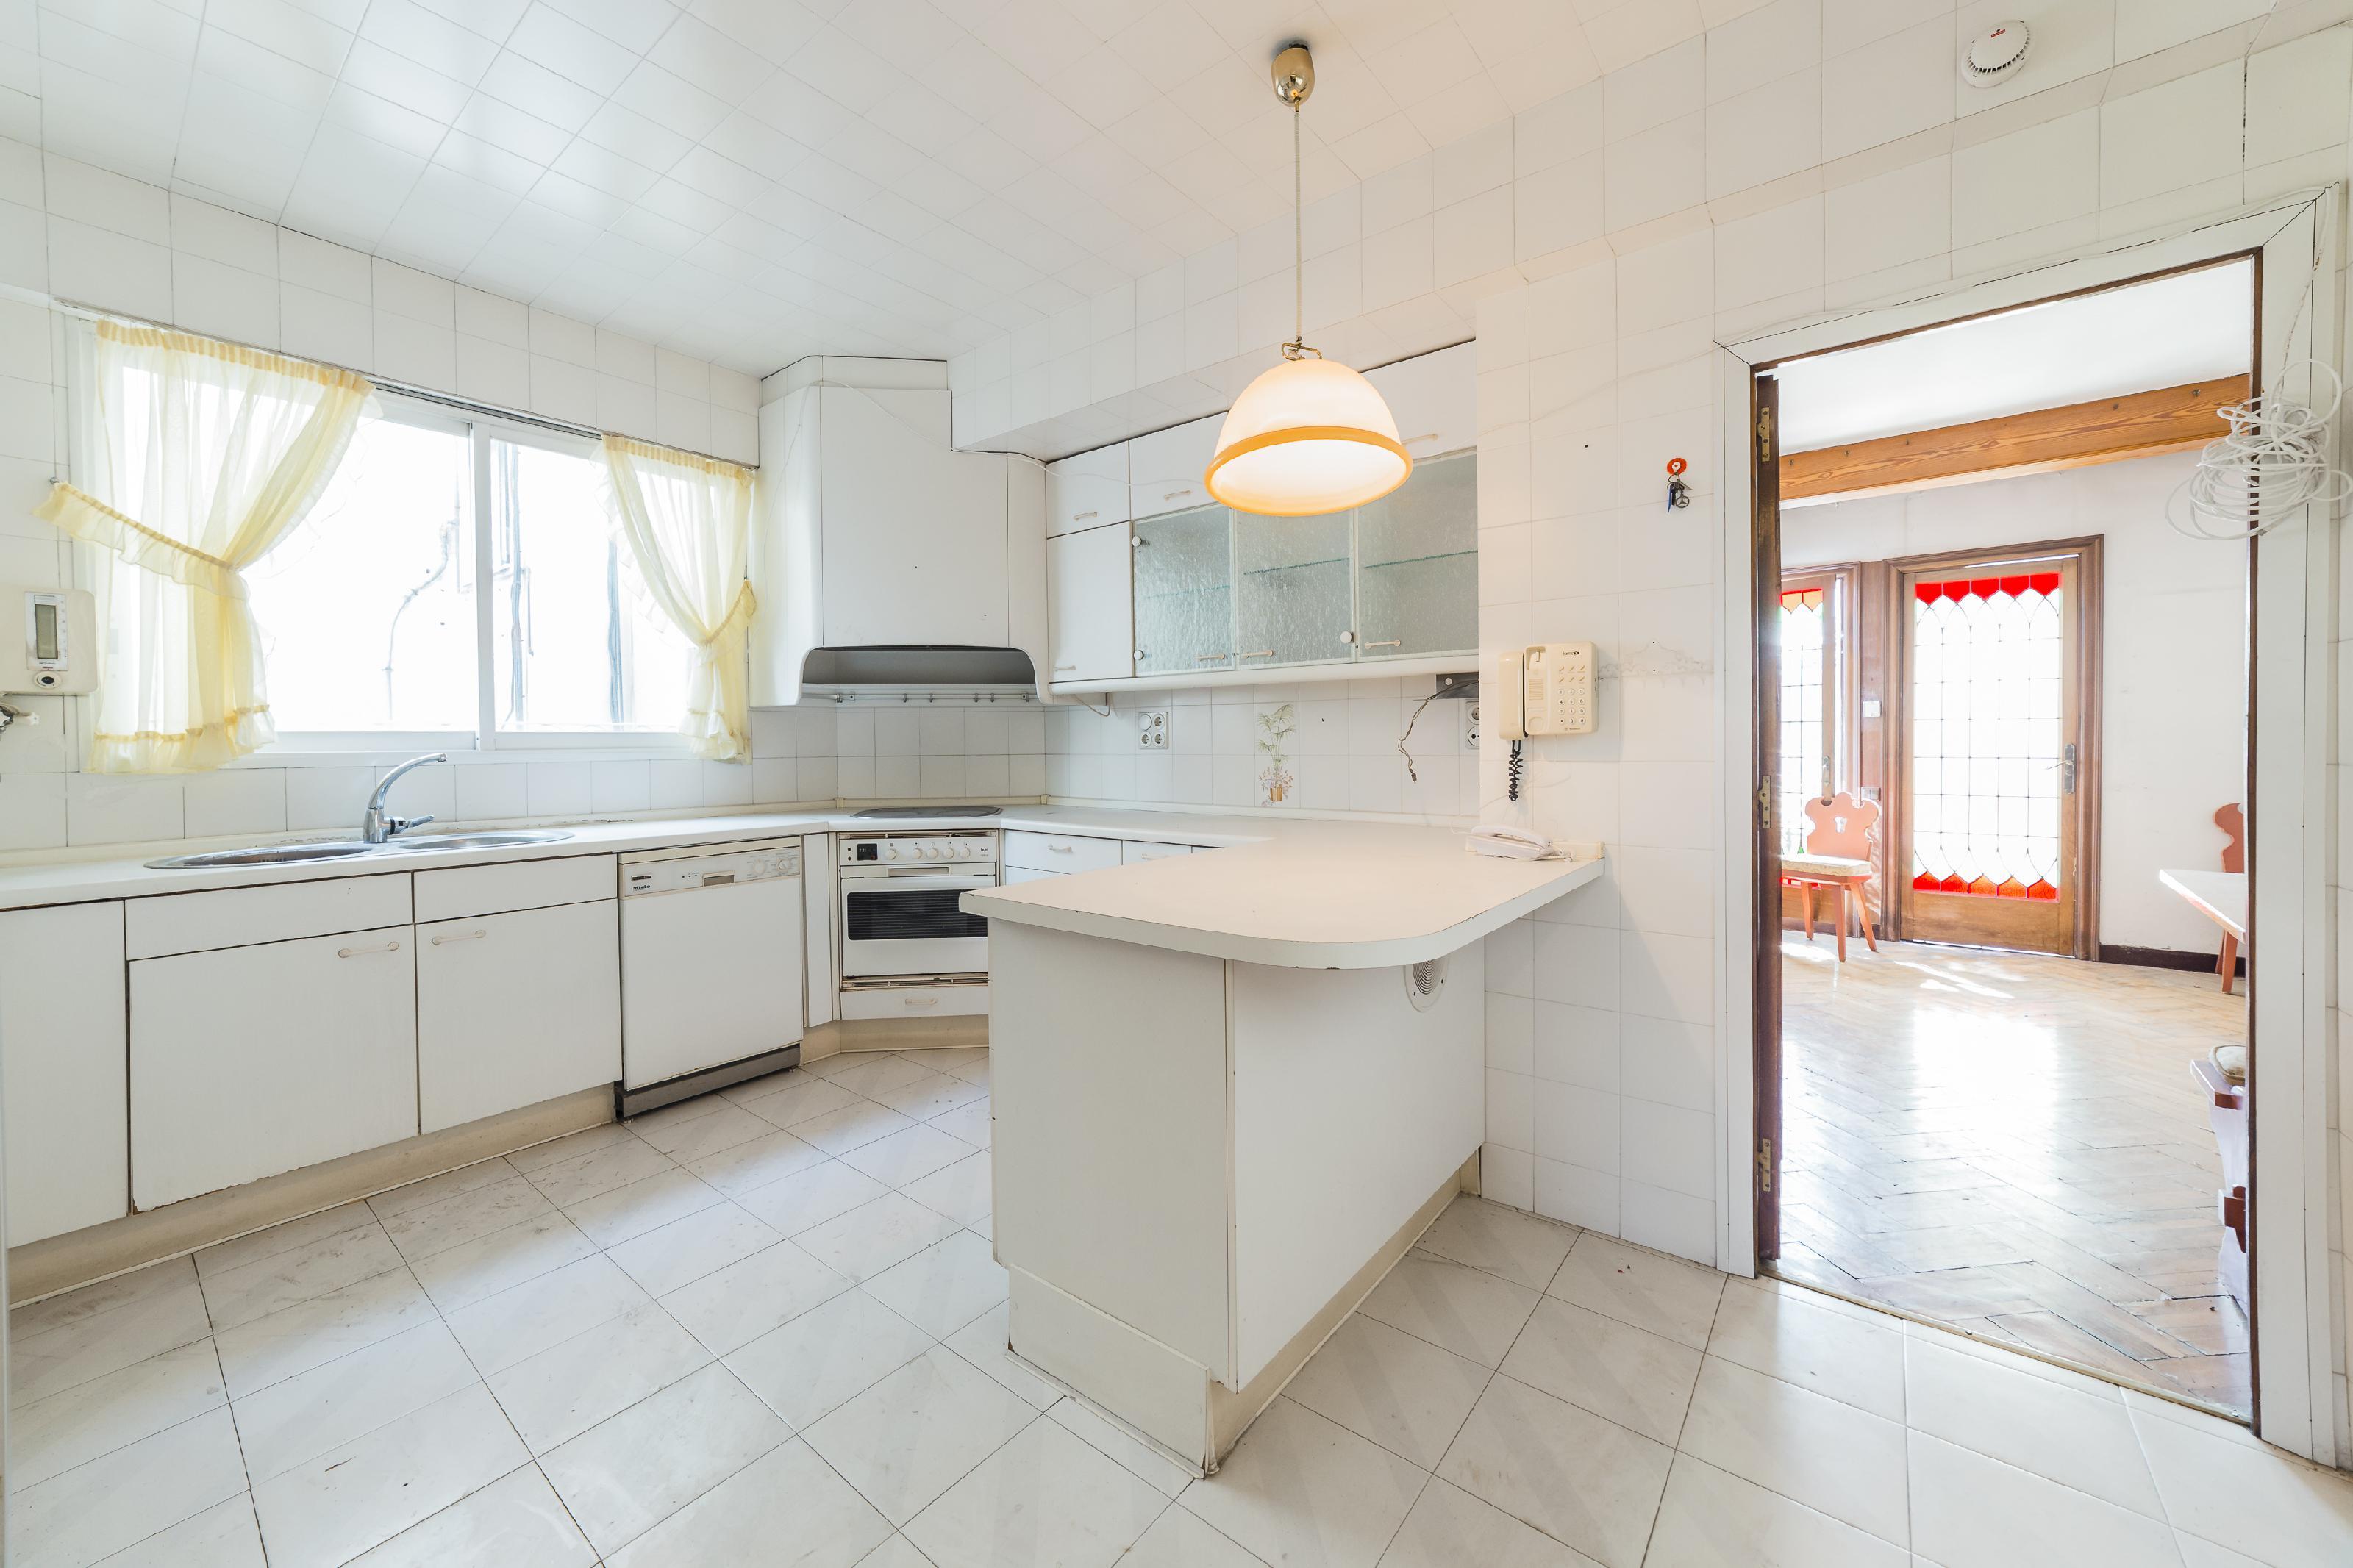 249314 Penthouse for sale in Sarrià-Sant Gervasi, Sant Gervasi-Galvany 5